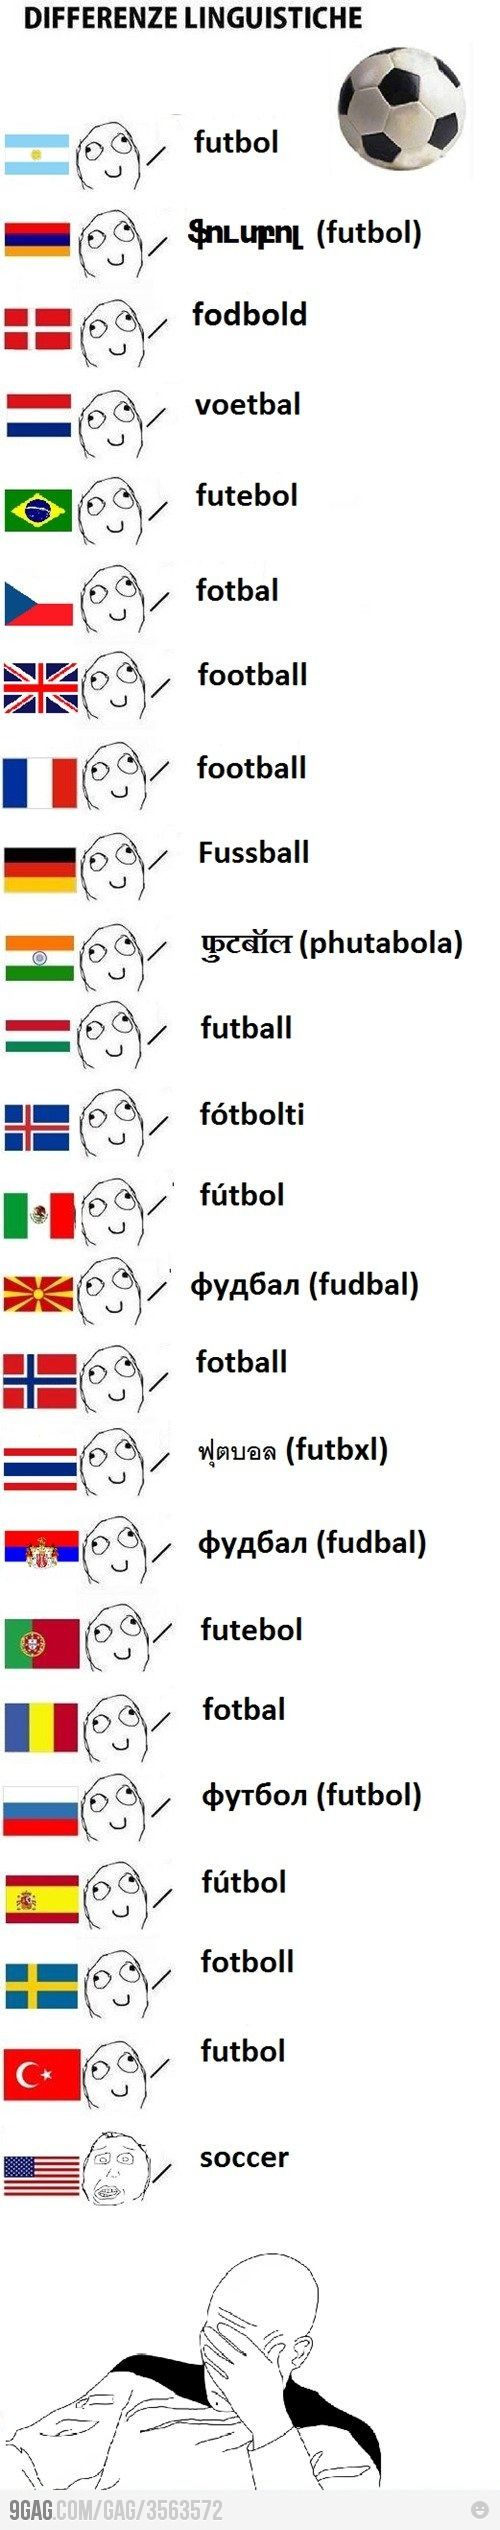 Football vs Soccer around the world